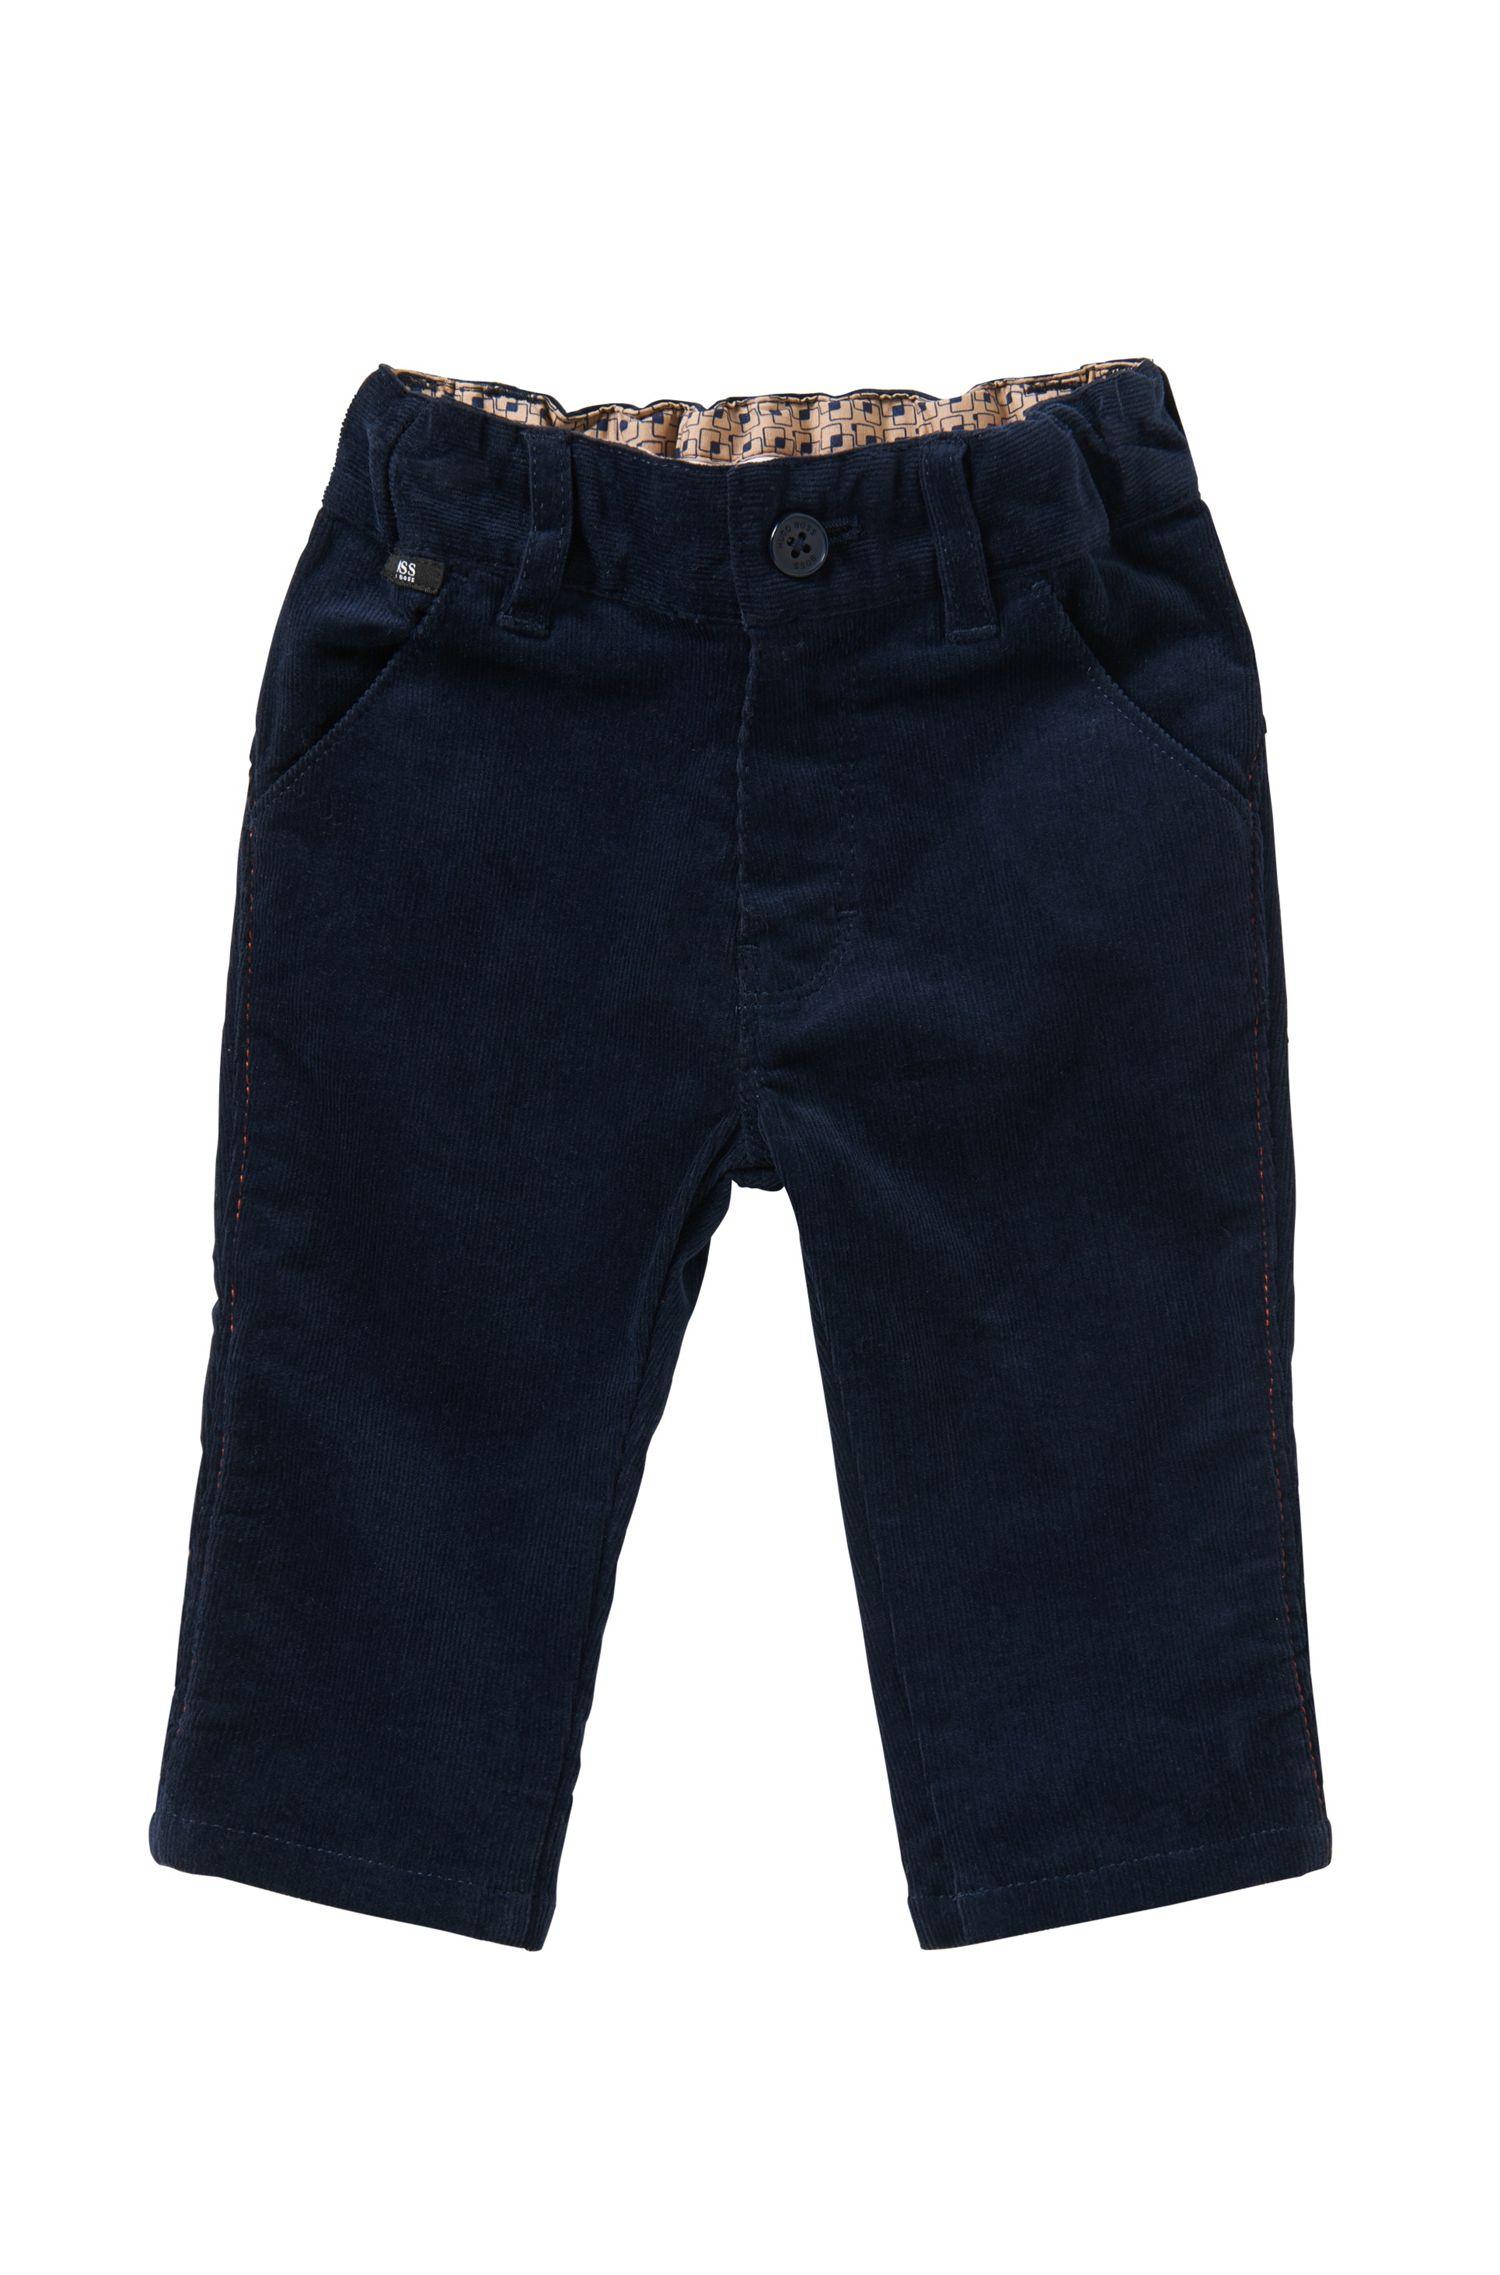 Baby-Cordhose aus Stretch-Baumwolle: 'J04199'